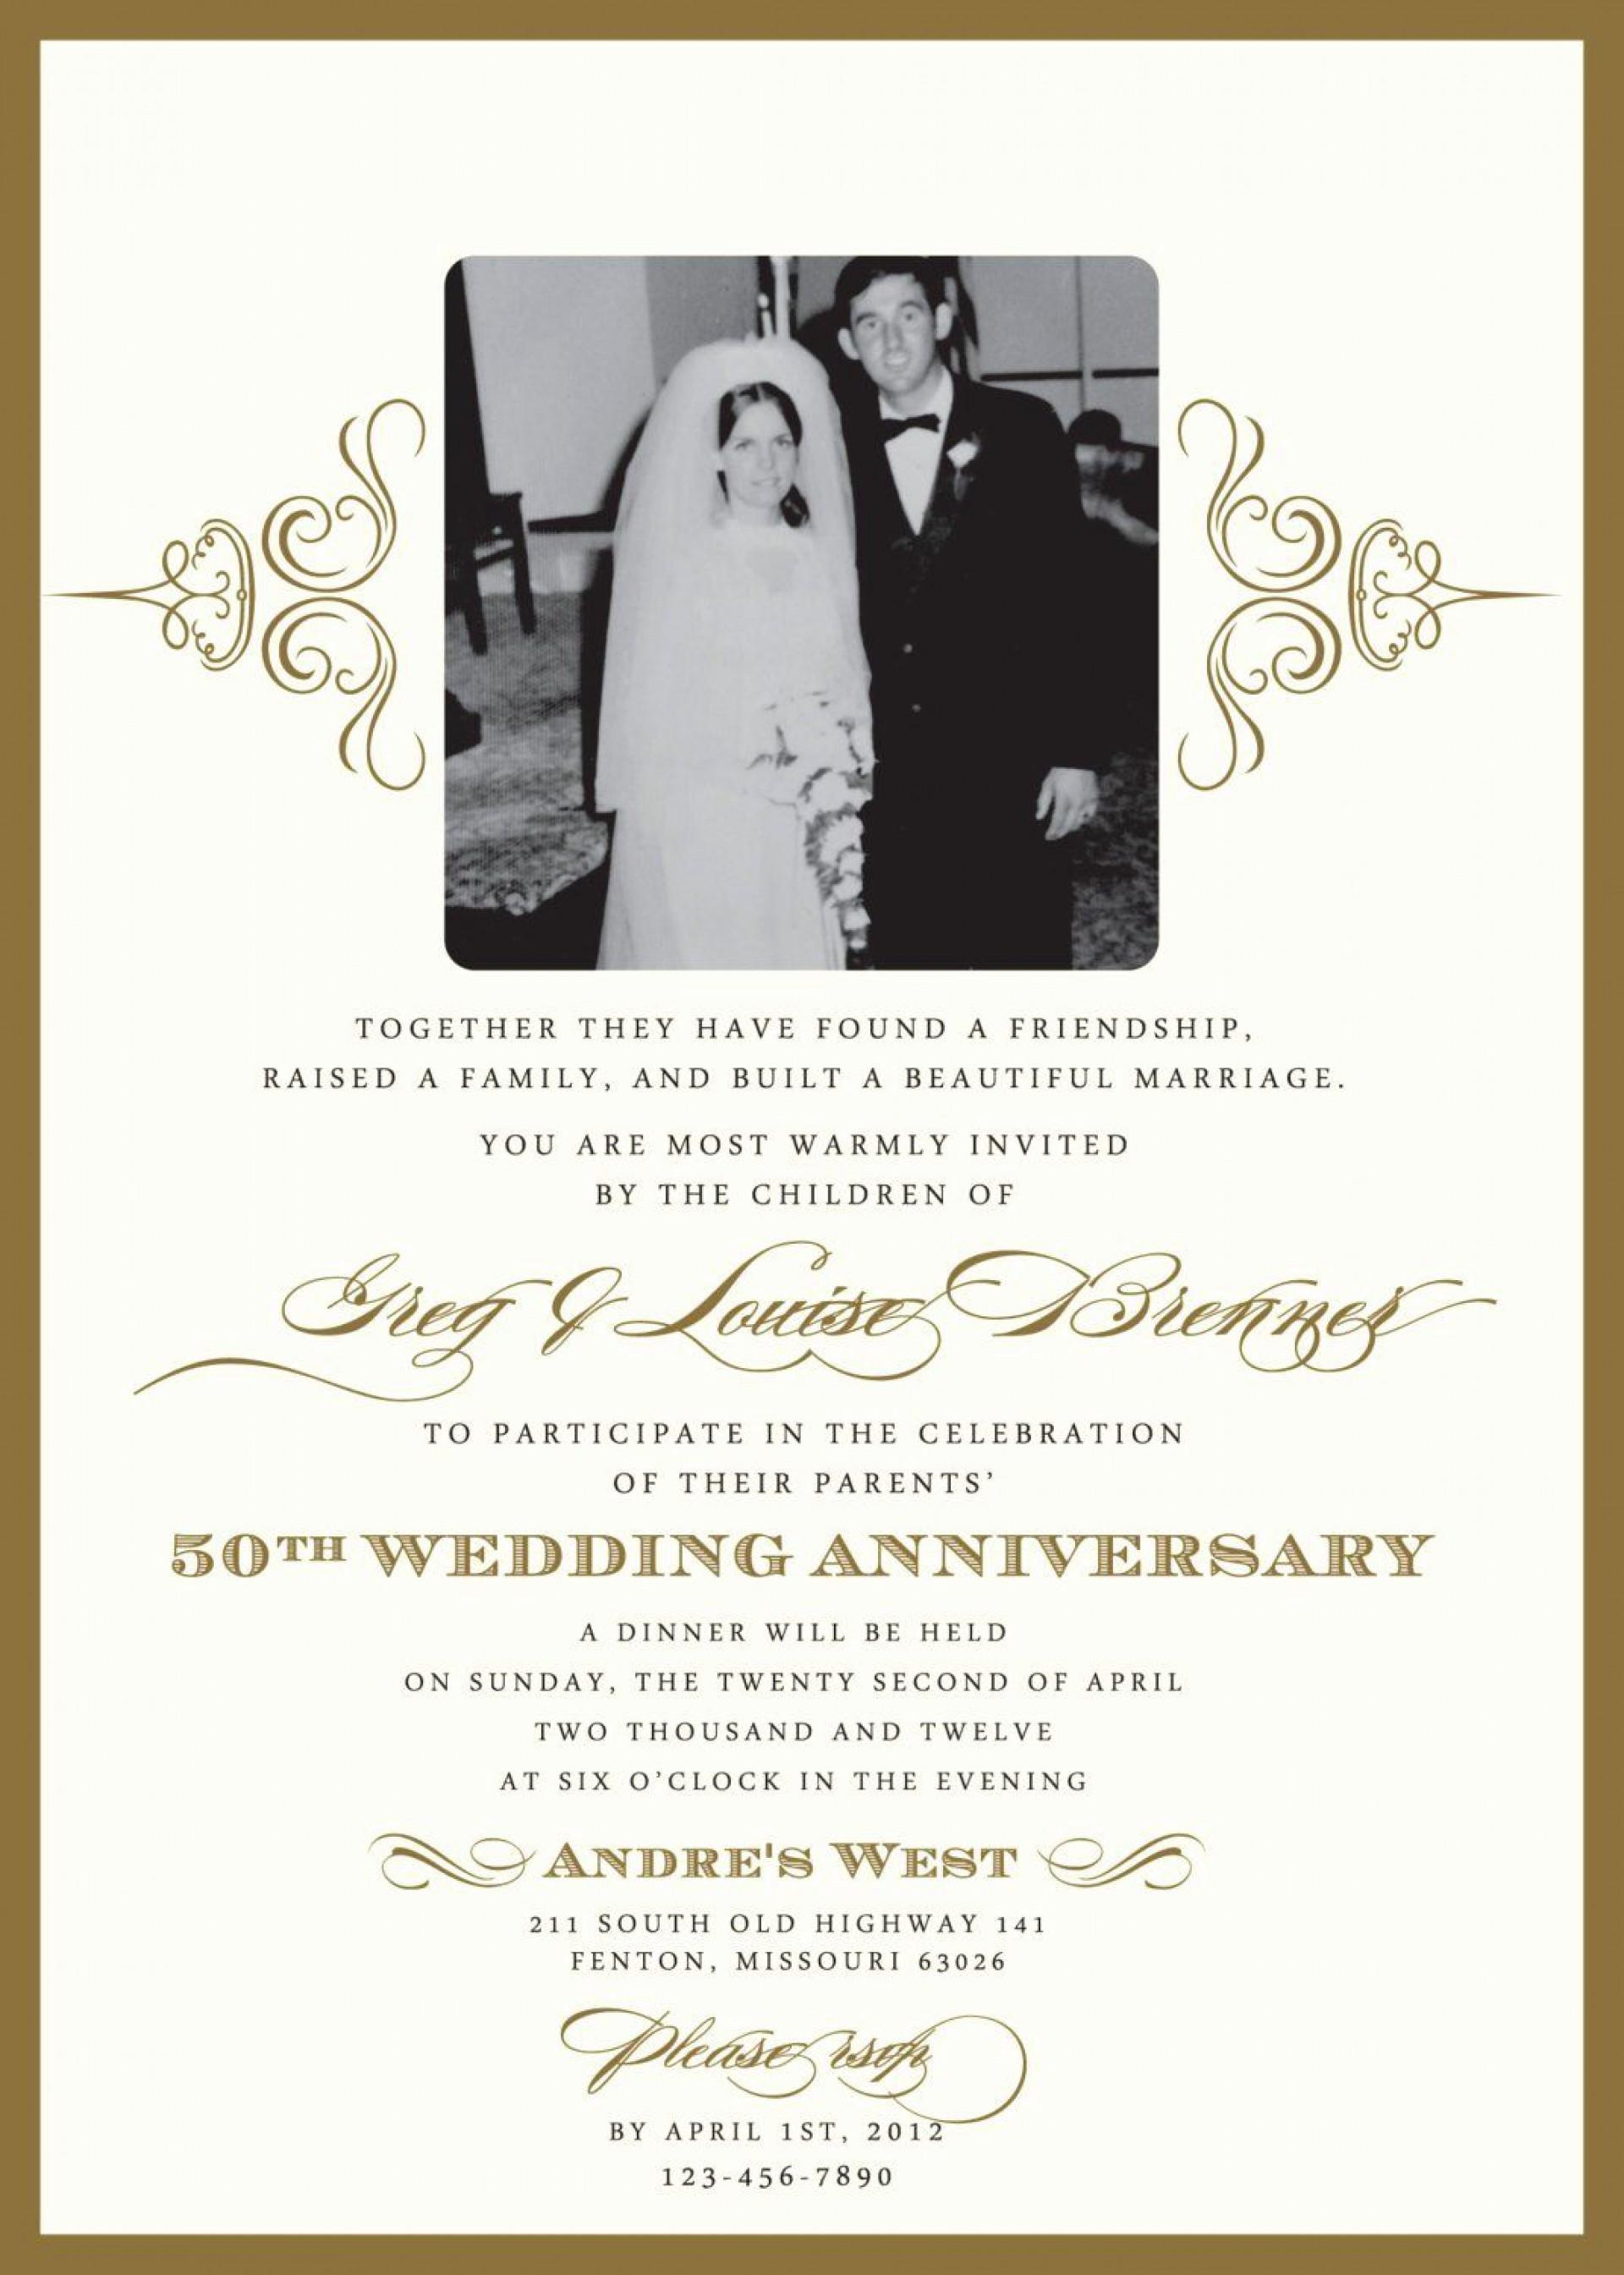 002 Impressive 50th Wedding Anniversary Invitation Template Free Highest Quality  Download Golden Microsoft Word1920